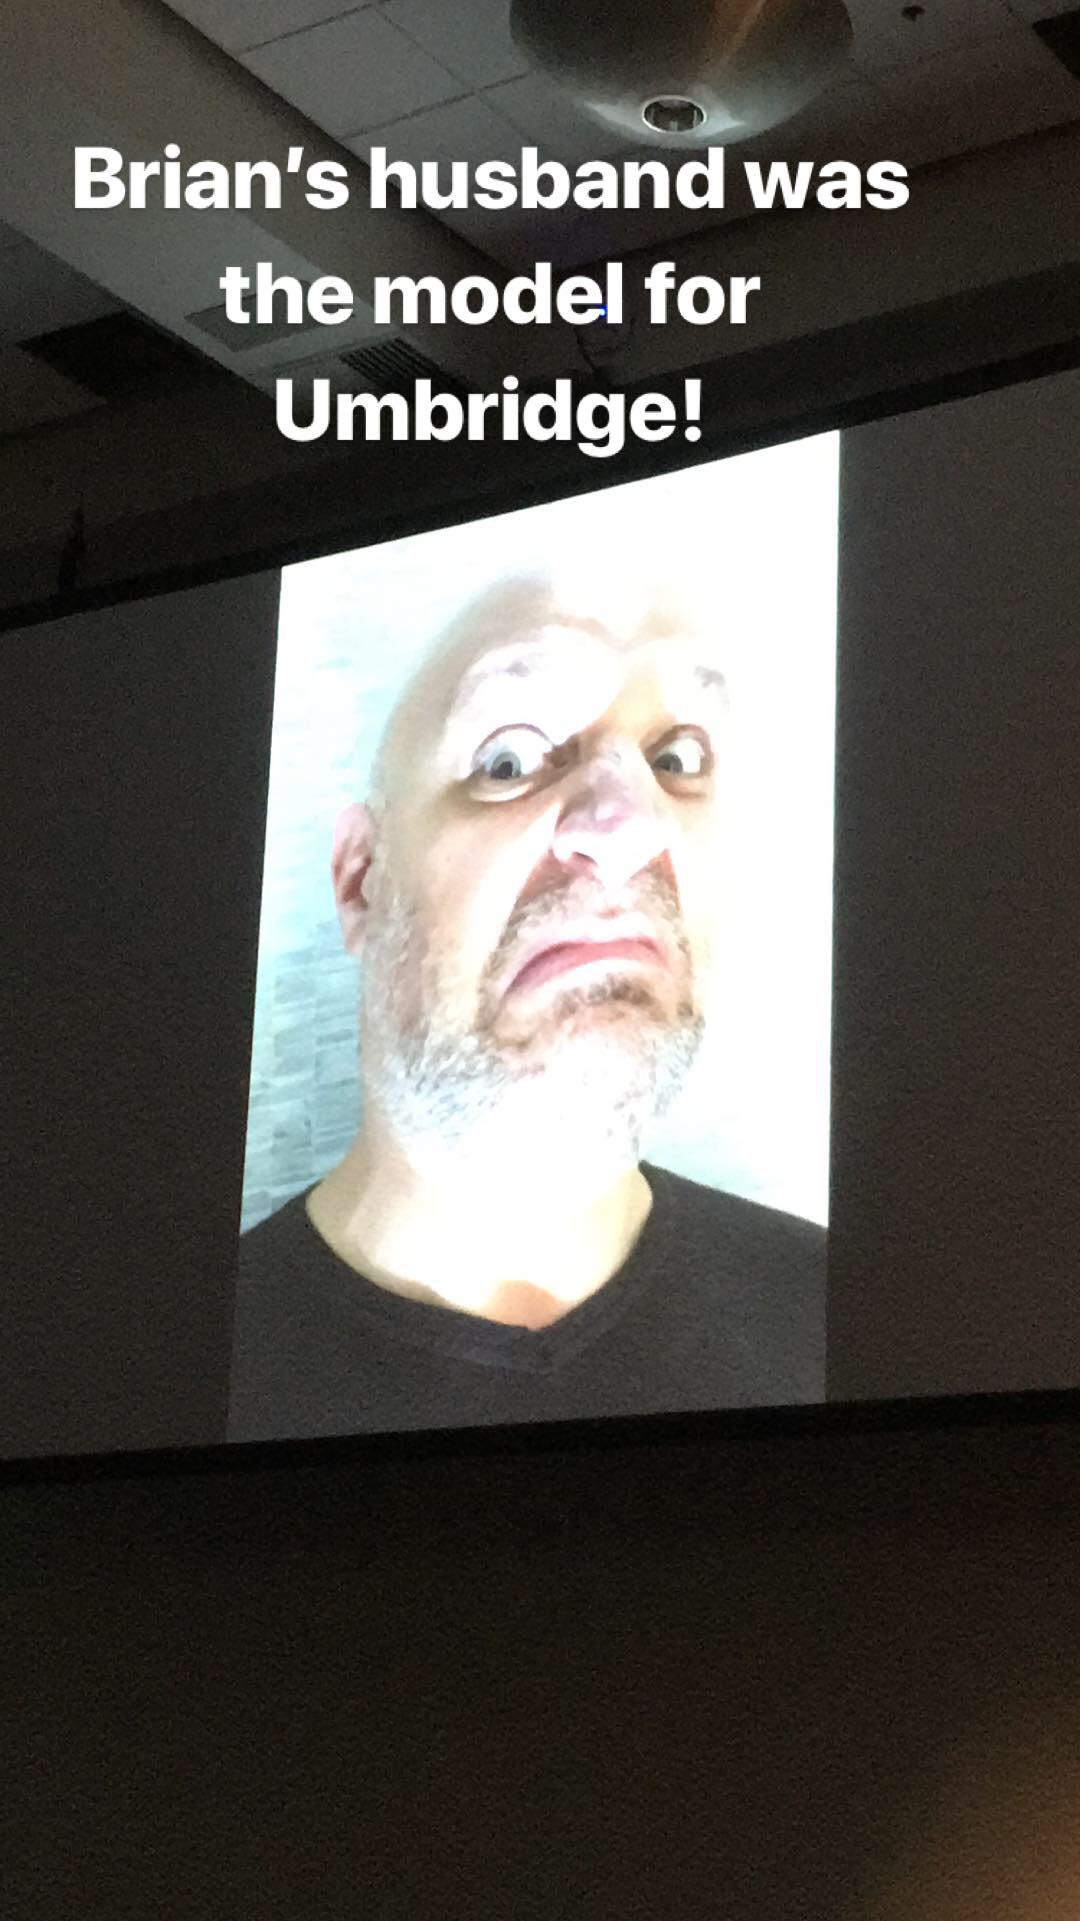 Brian Selznick's husband models for Professor Umbridge!